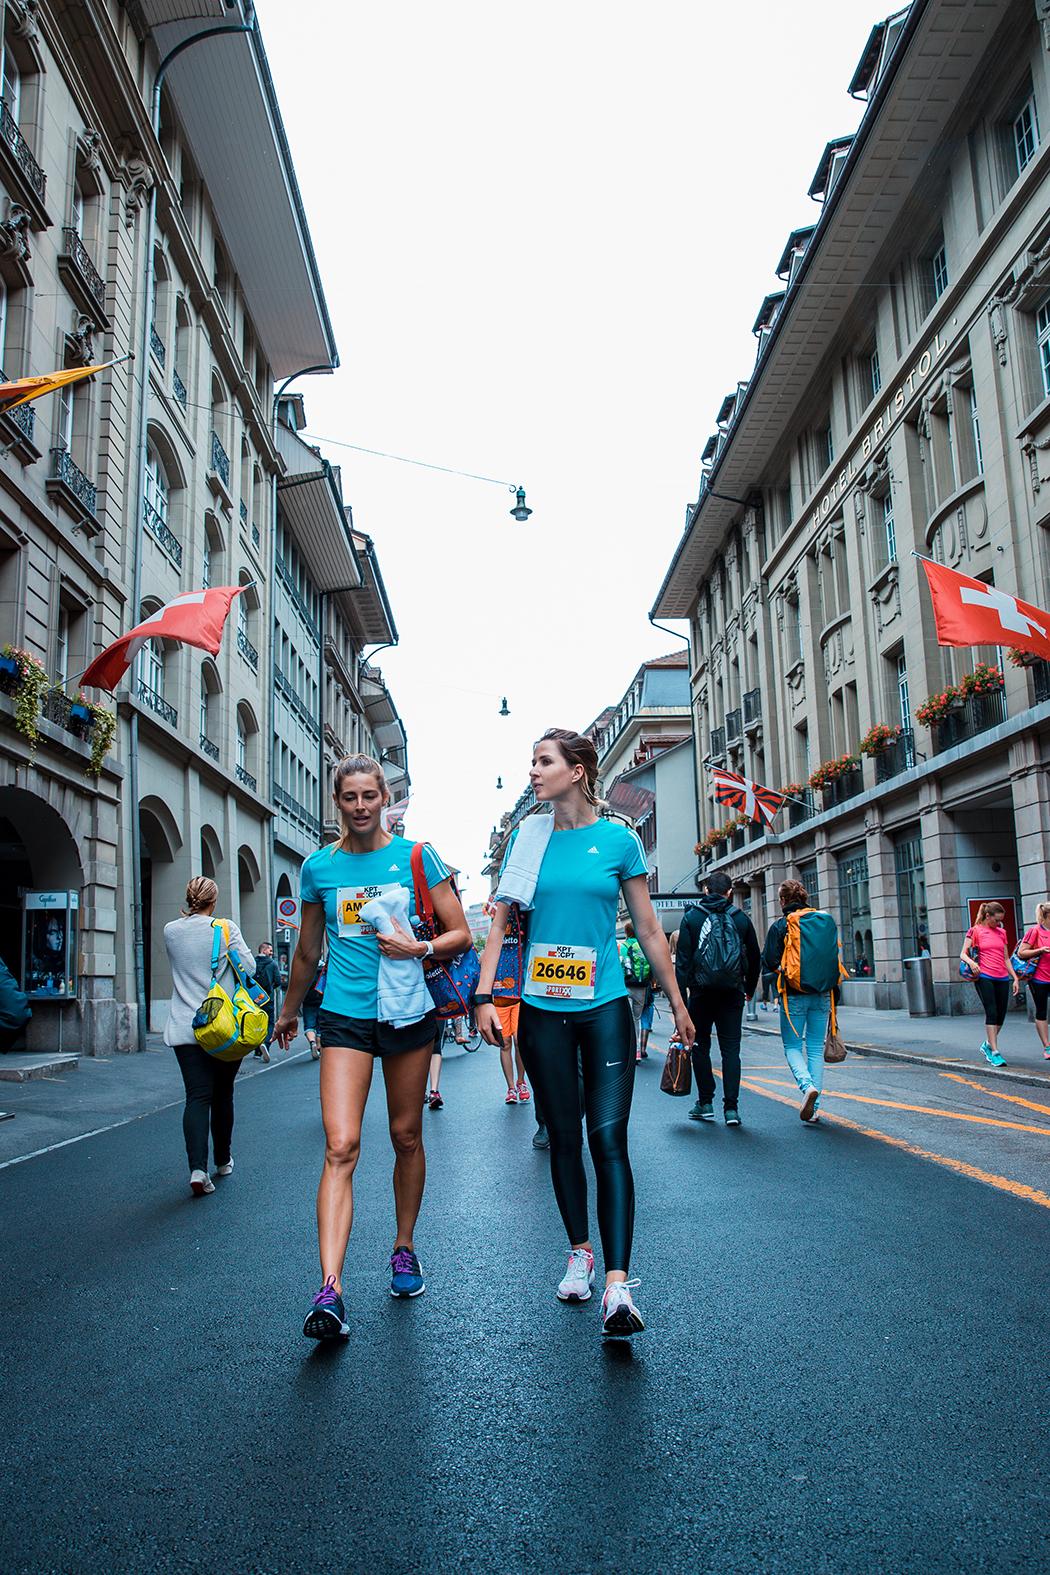 Fitnessblog-Fitnessblogger-Fitness-Blog-Blogger-Frauenlauf-Bern-Biotherm-livemore-13-web